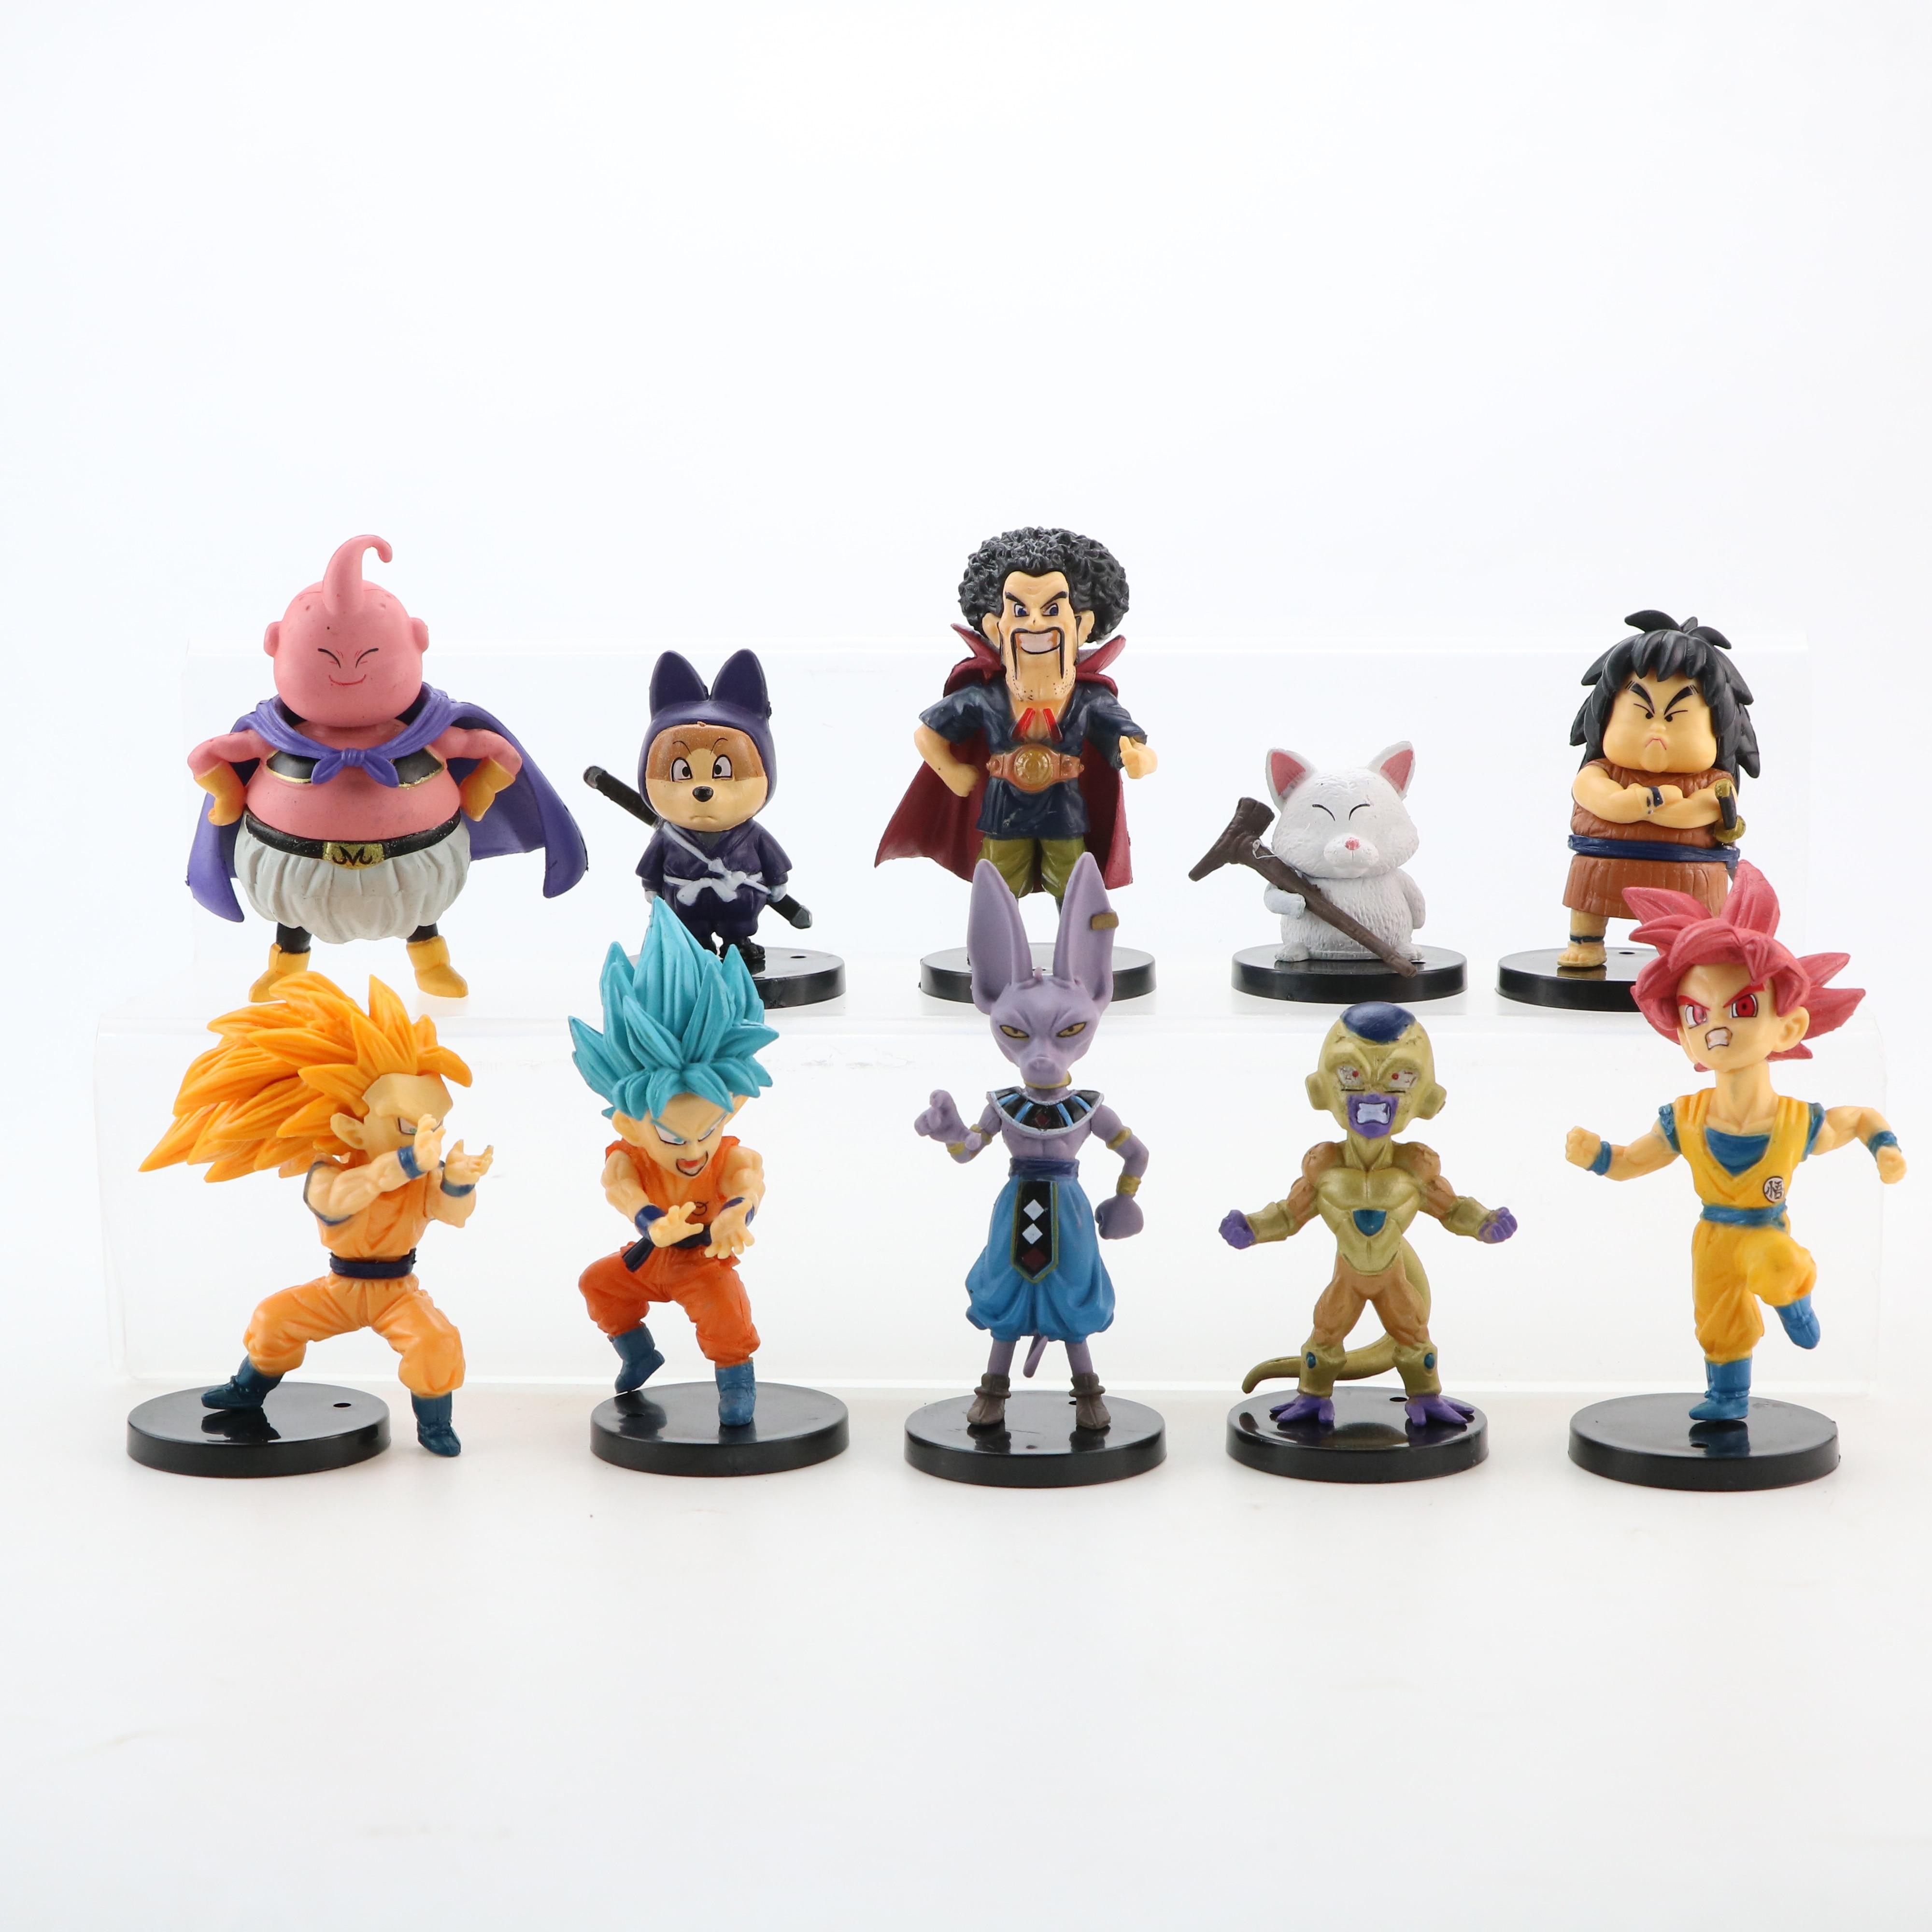 Image 4 - 10pcs/lot Dragon Ball Gogeta Vegeta Z Son Goku Gohan Broly Trunks Frieza Majin Buu Piccolo Dragonball Action Figure Set PVC ToysAction & Toy Figures   -